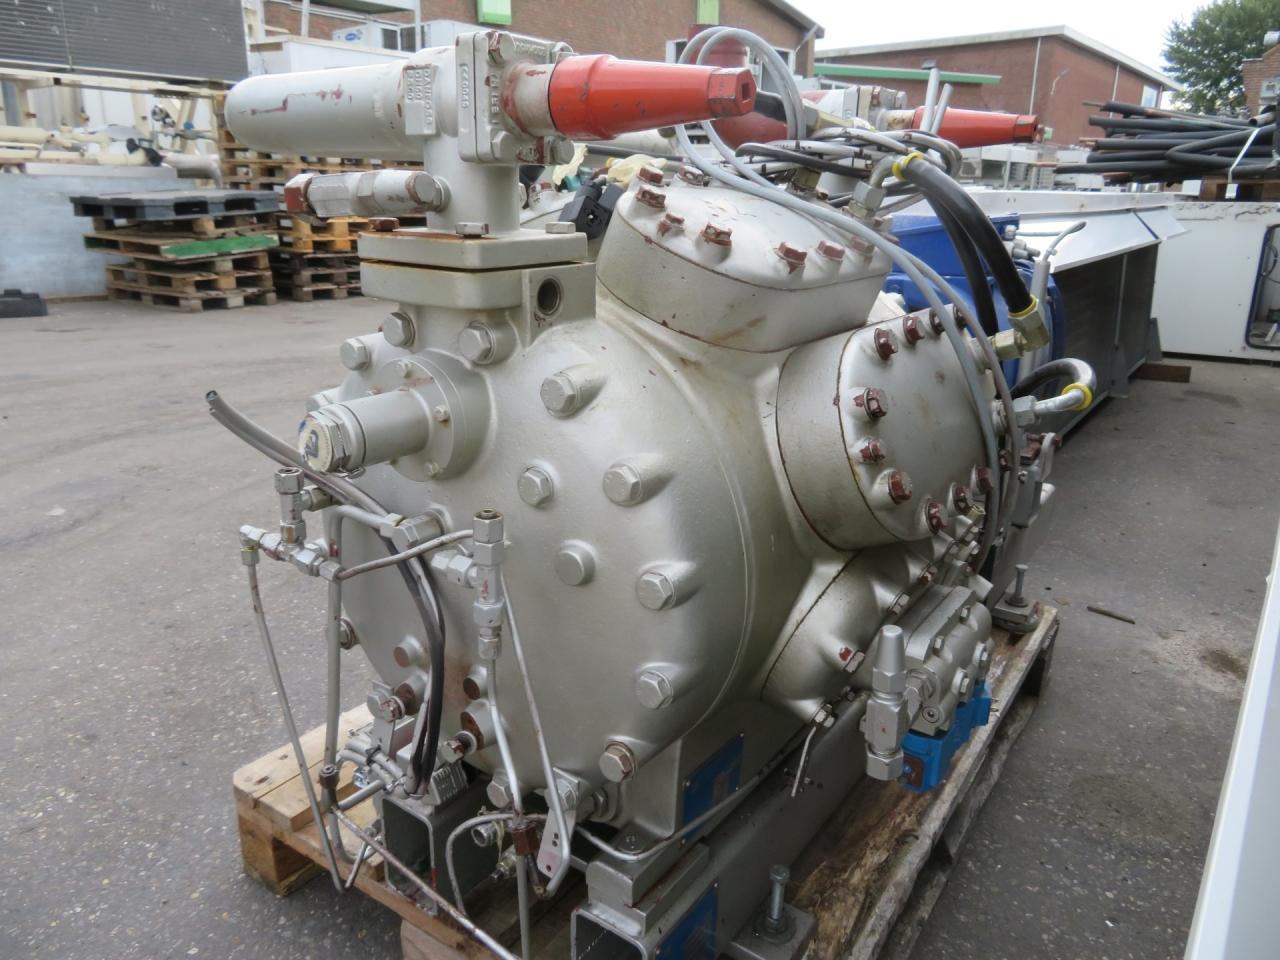 Compressor unit Sabroe CMO 28 - HOS BV - Gebruikte Koeltechniek (Used  Refrigeration Equipment)